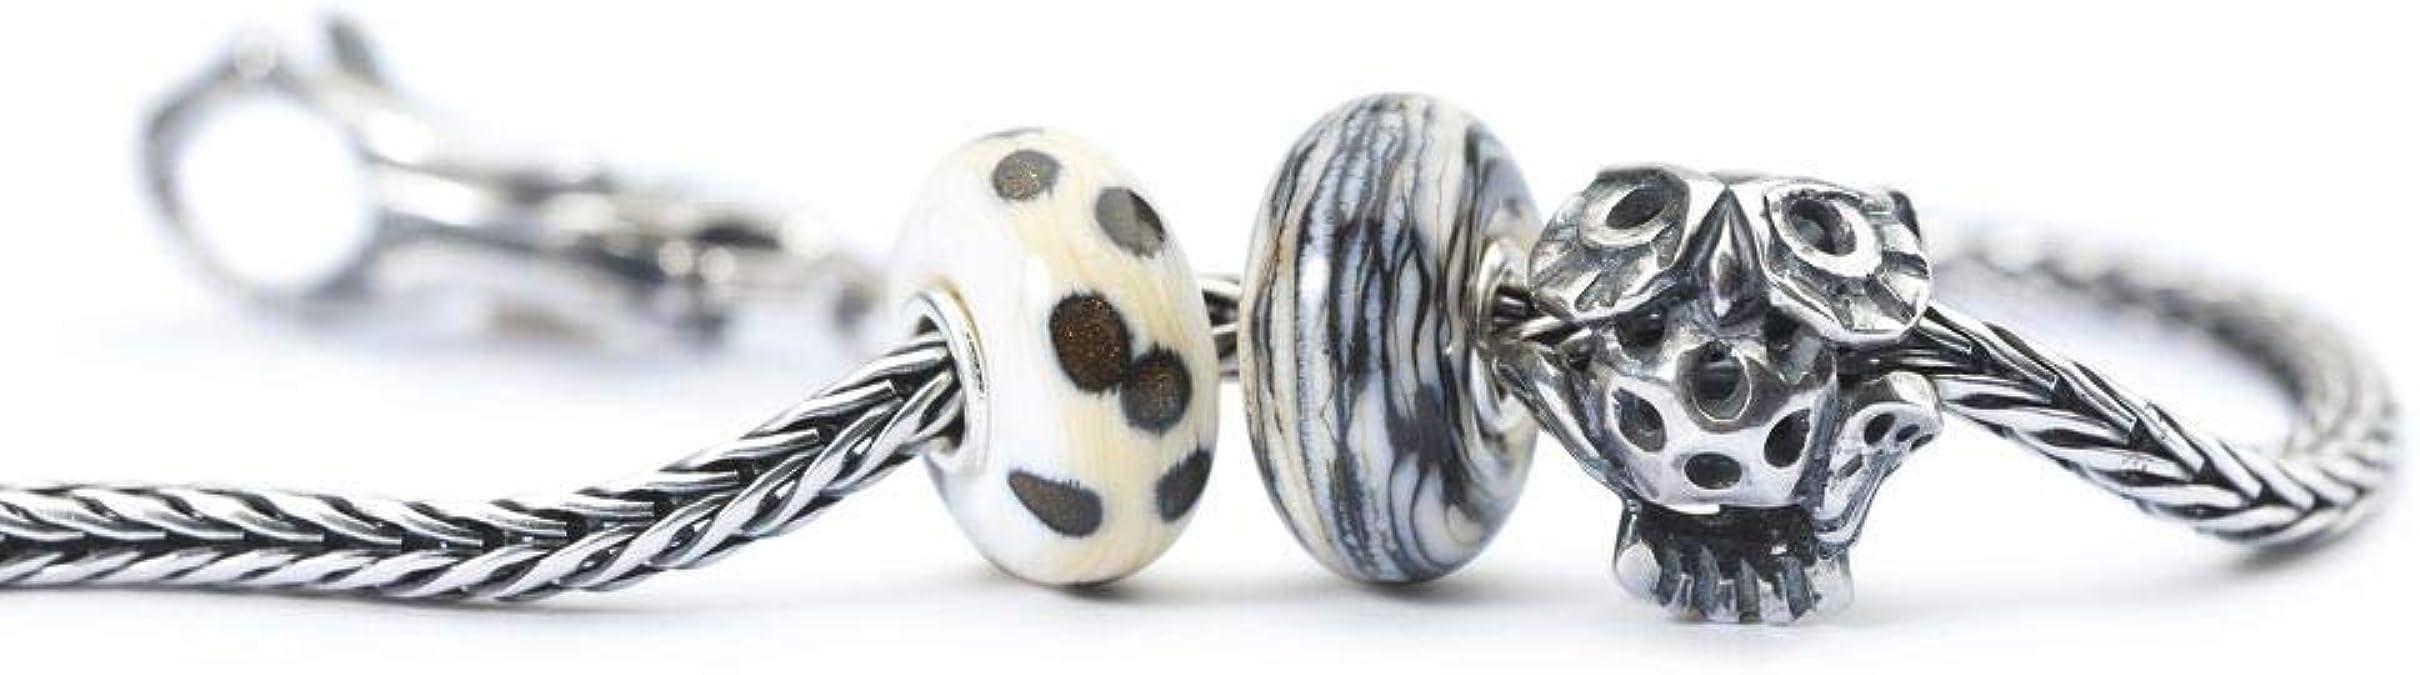 TGLBE-10417 Trollbeads Femme Argent Charms et perles